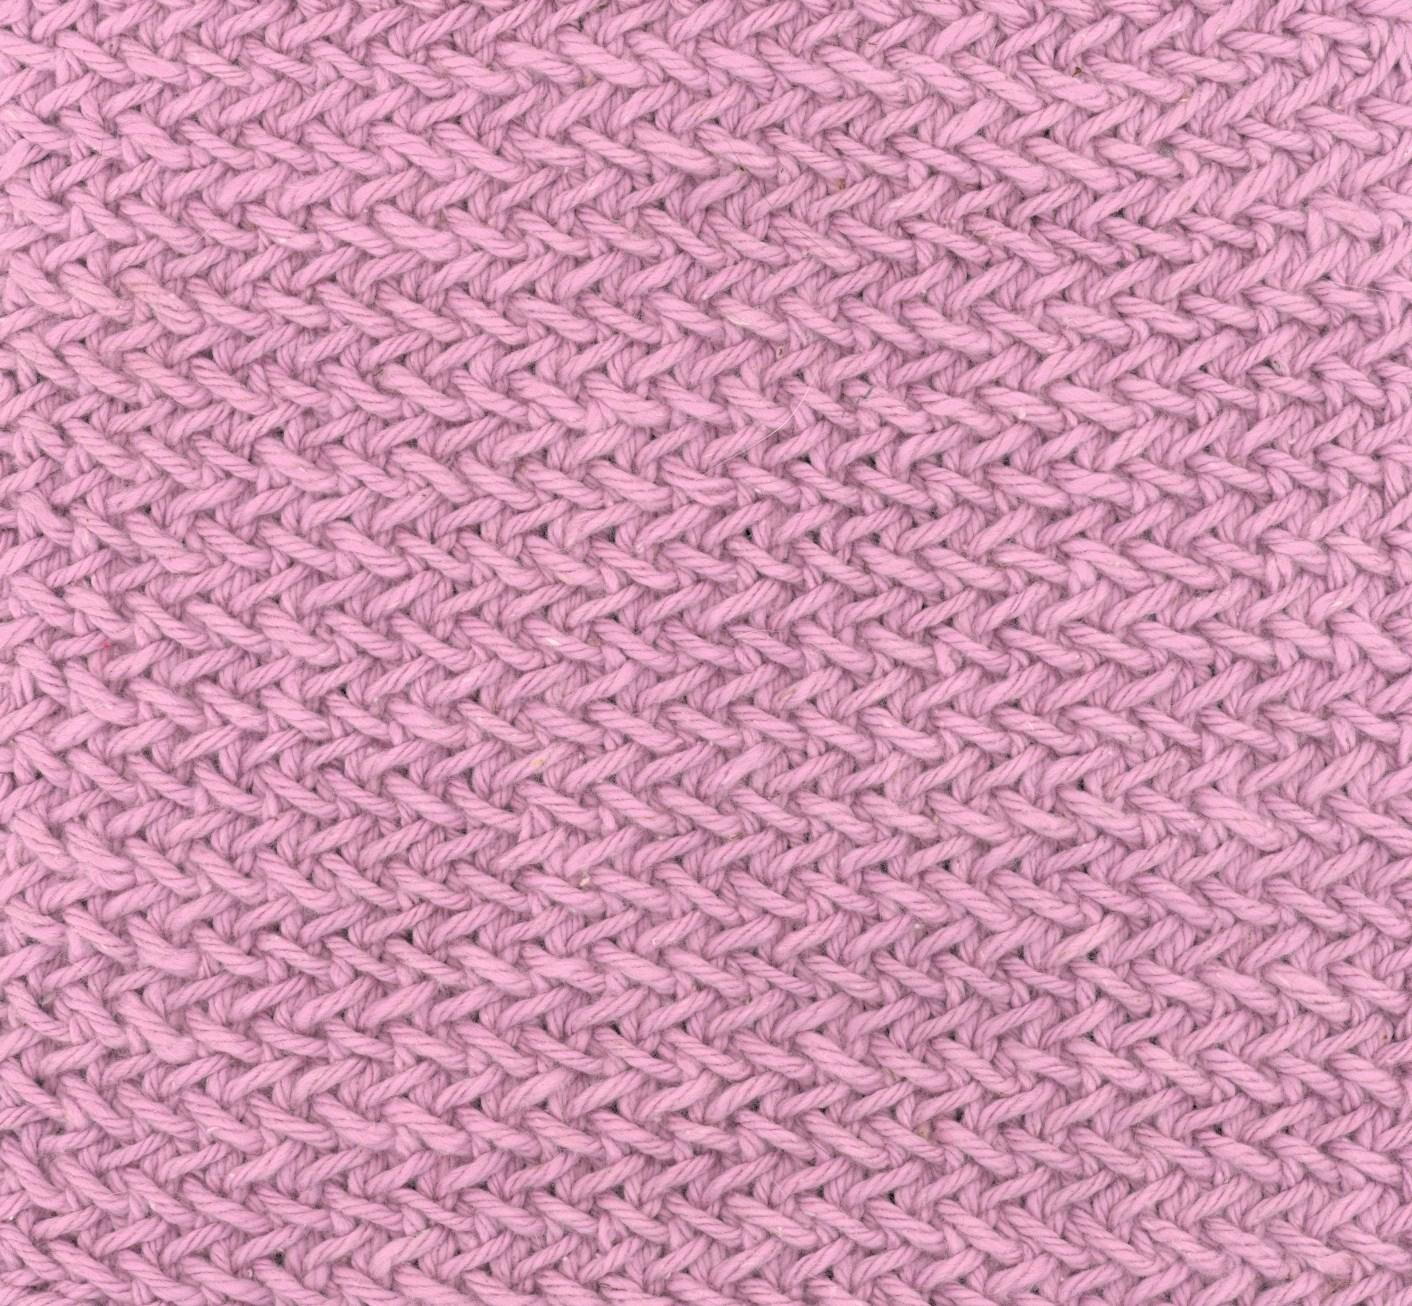 Saras Colorwave Blog: HERRINGBONE STITCH DISHCLOTH